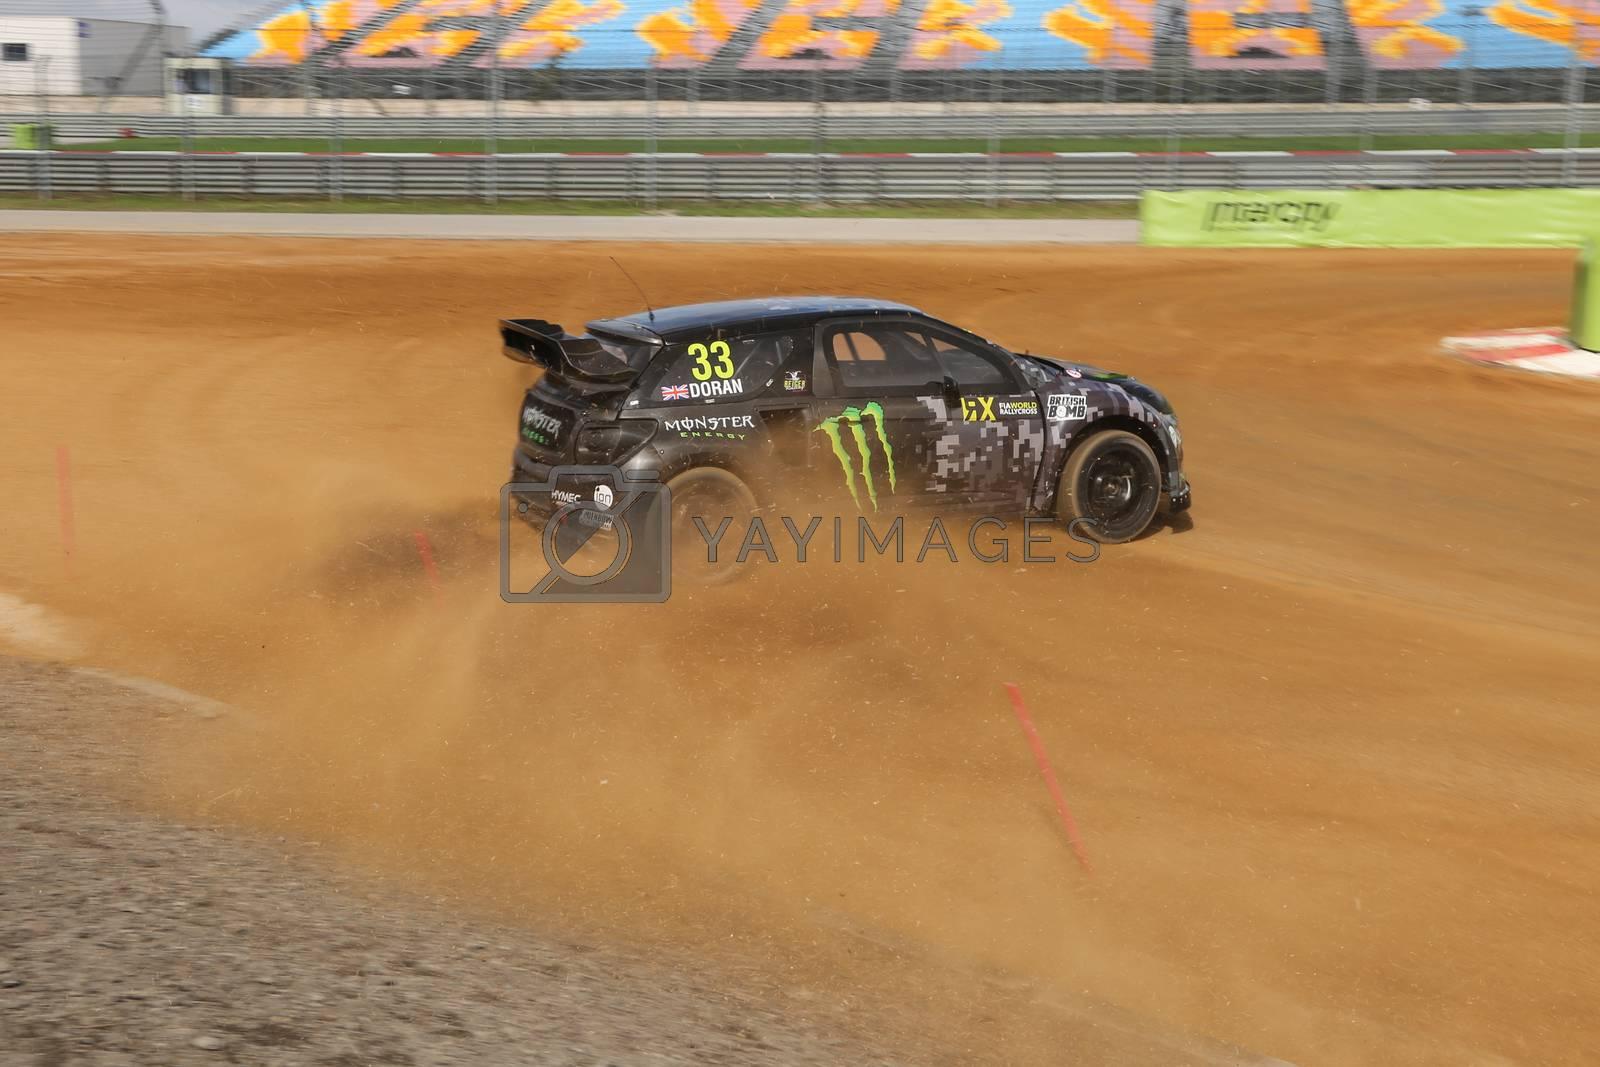 ISTANBUL, TURKEY - OCTOBER 03, 2015: Liam Doran drives Citroen DS3 of SDRX Team in FIA World Rallycross Championship.